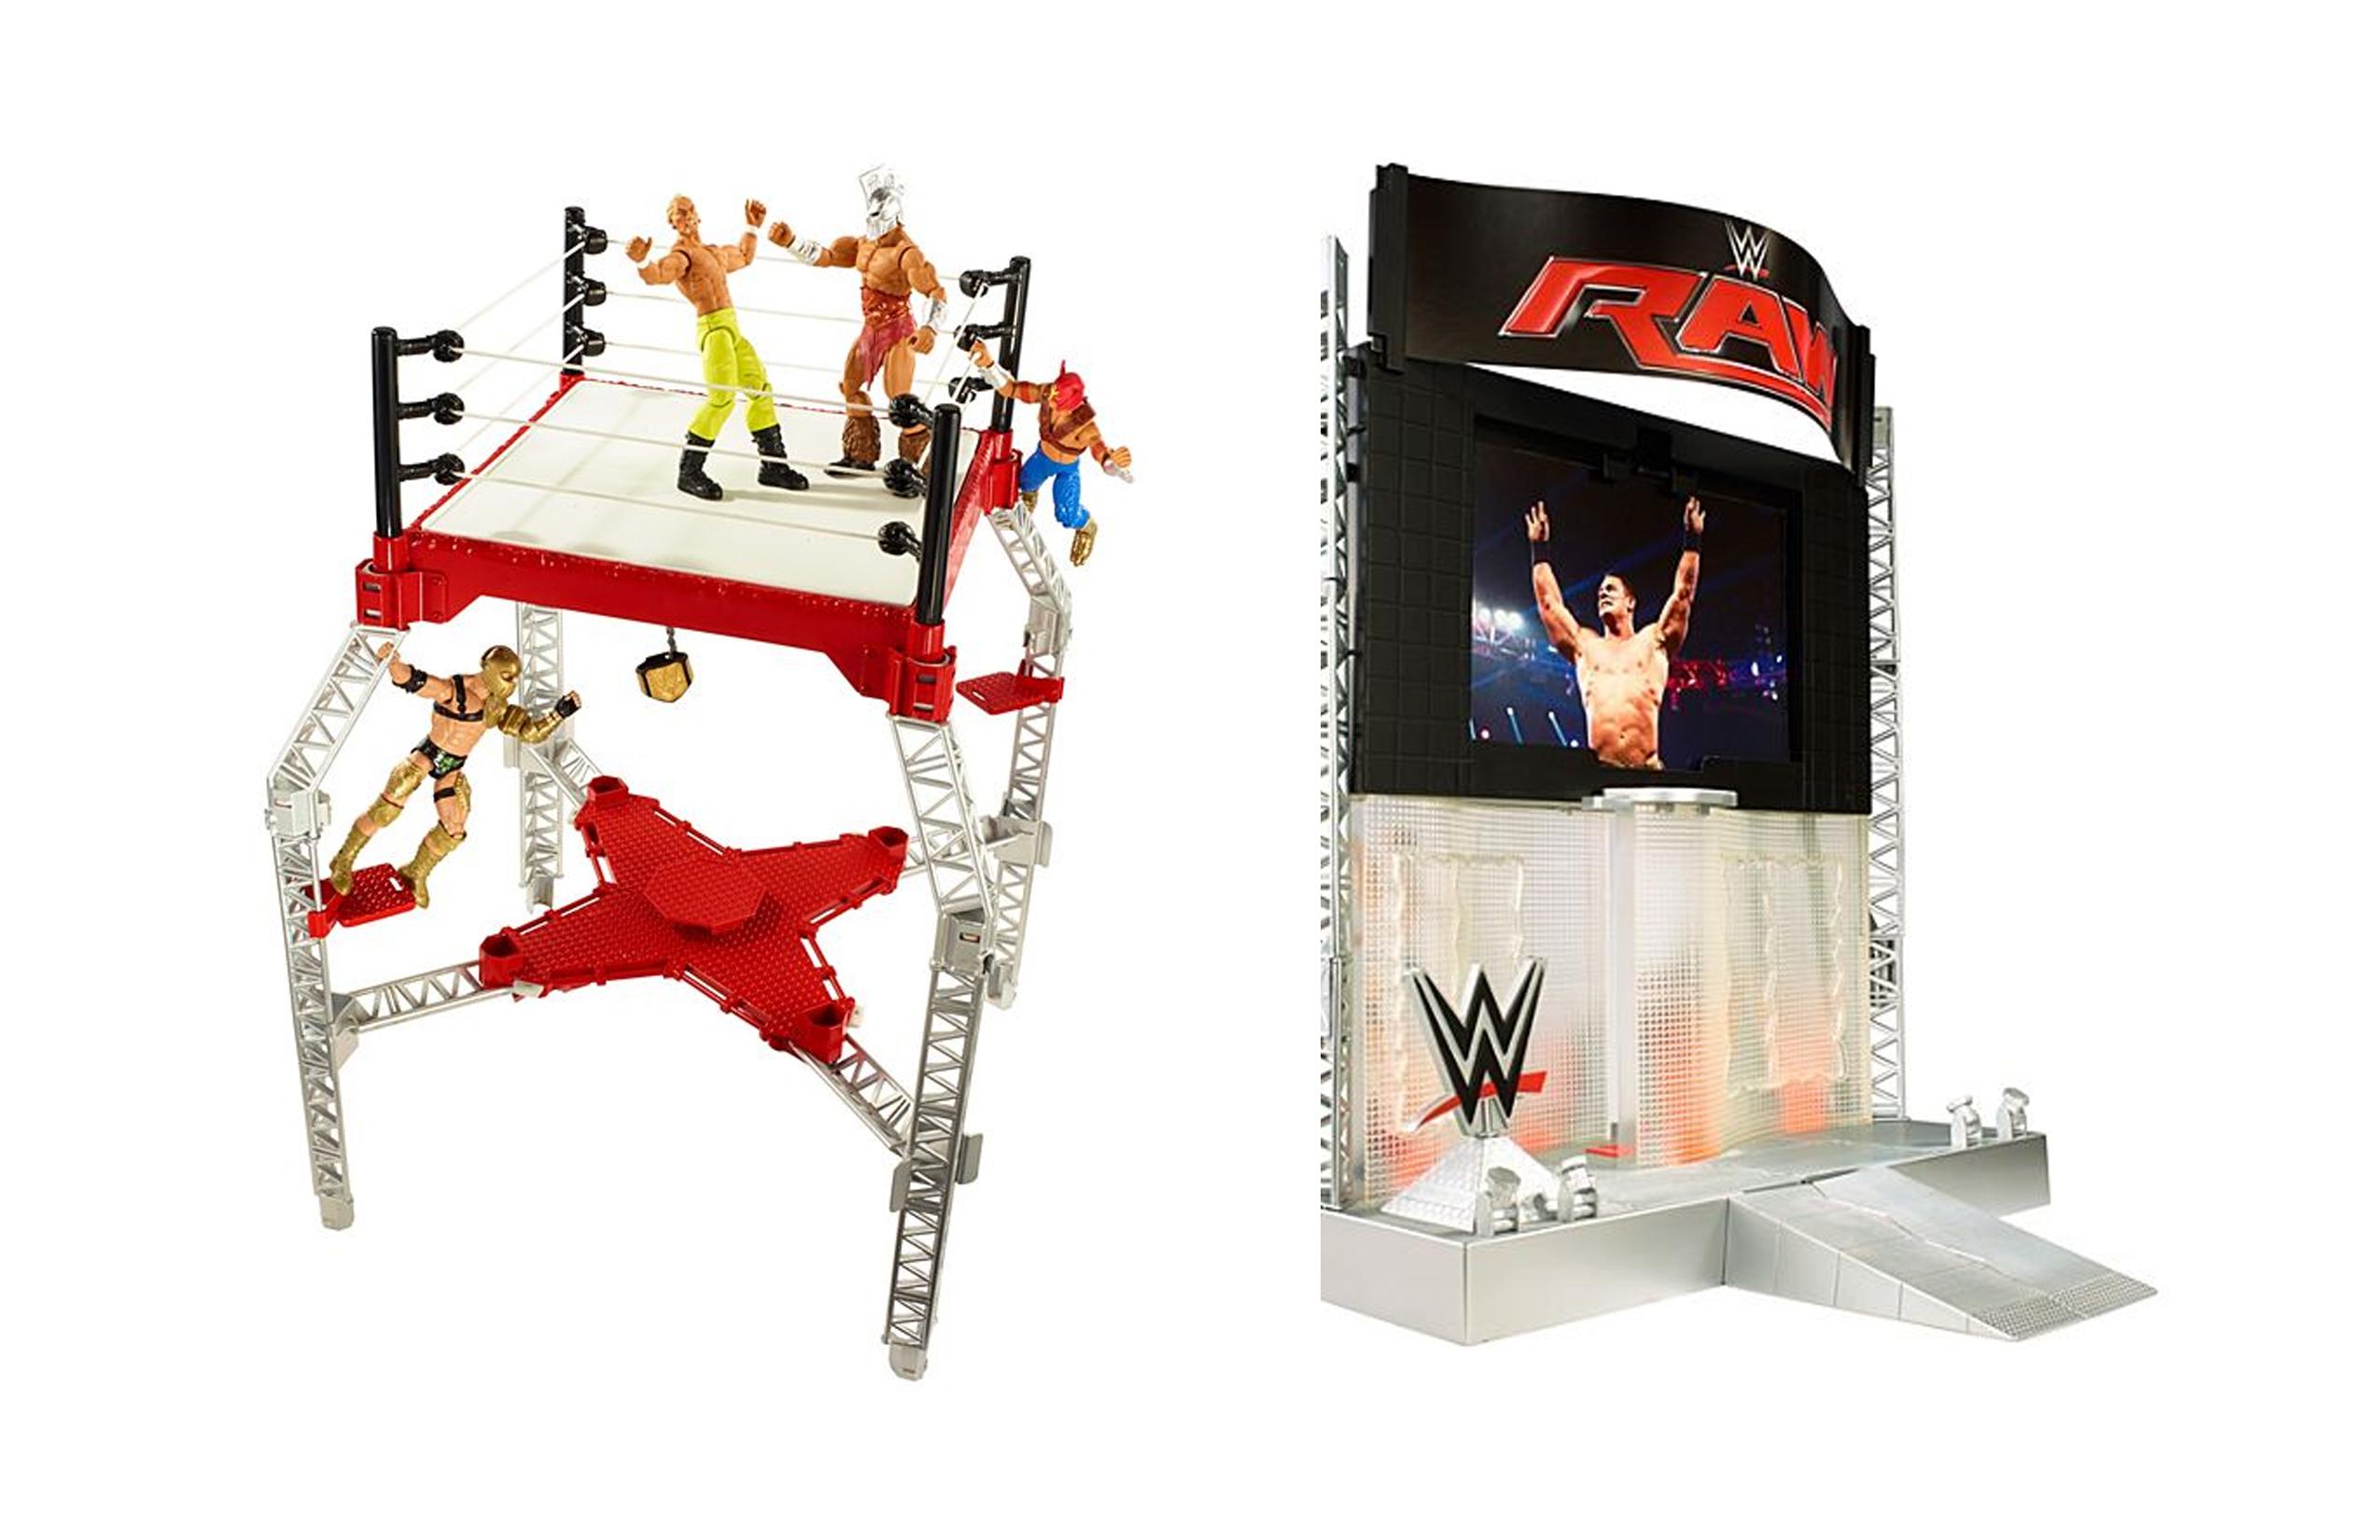 WWEPlaysets